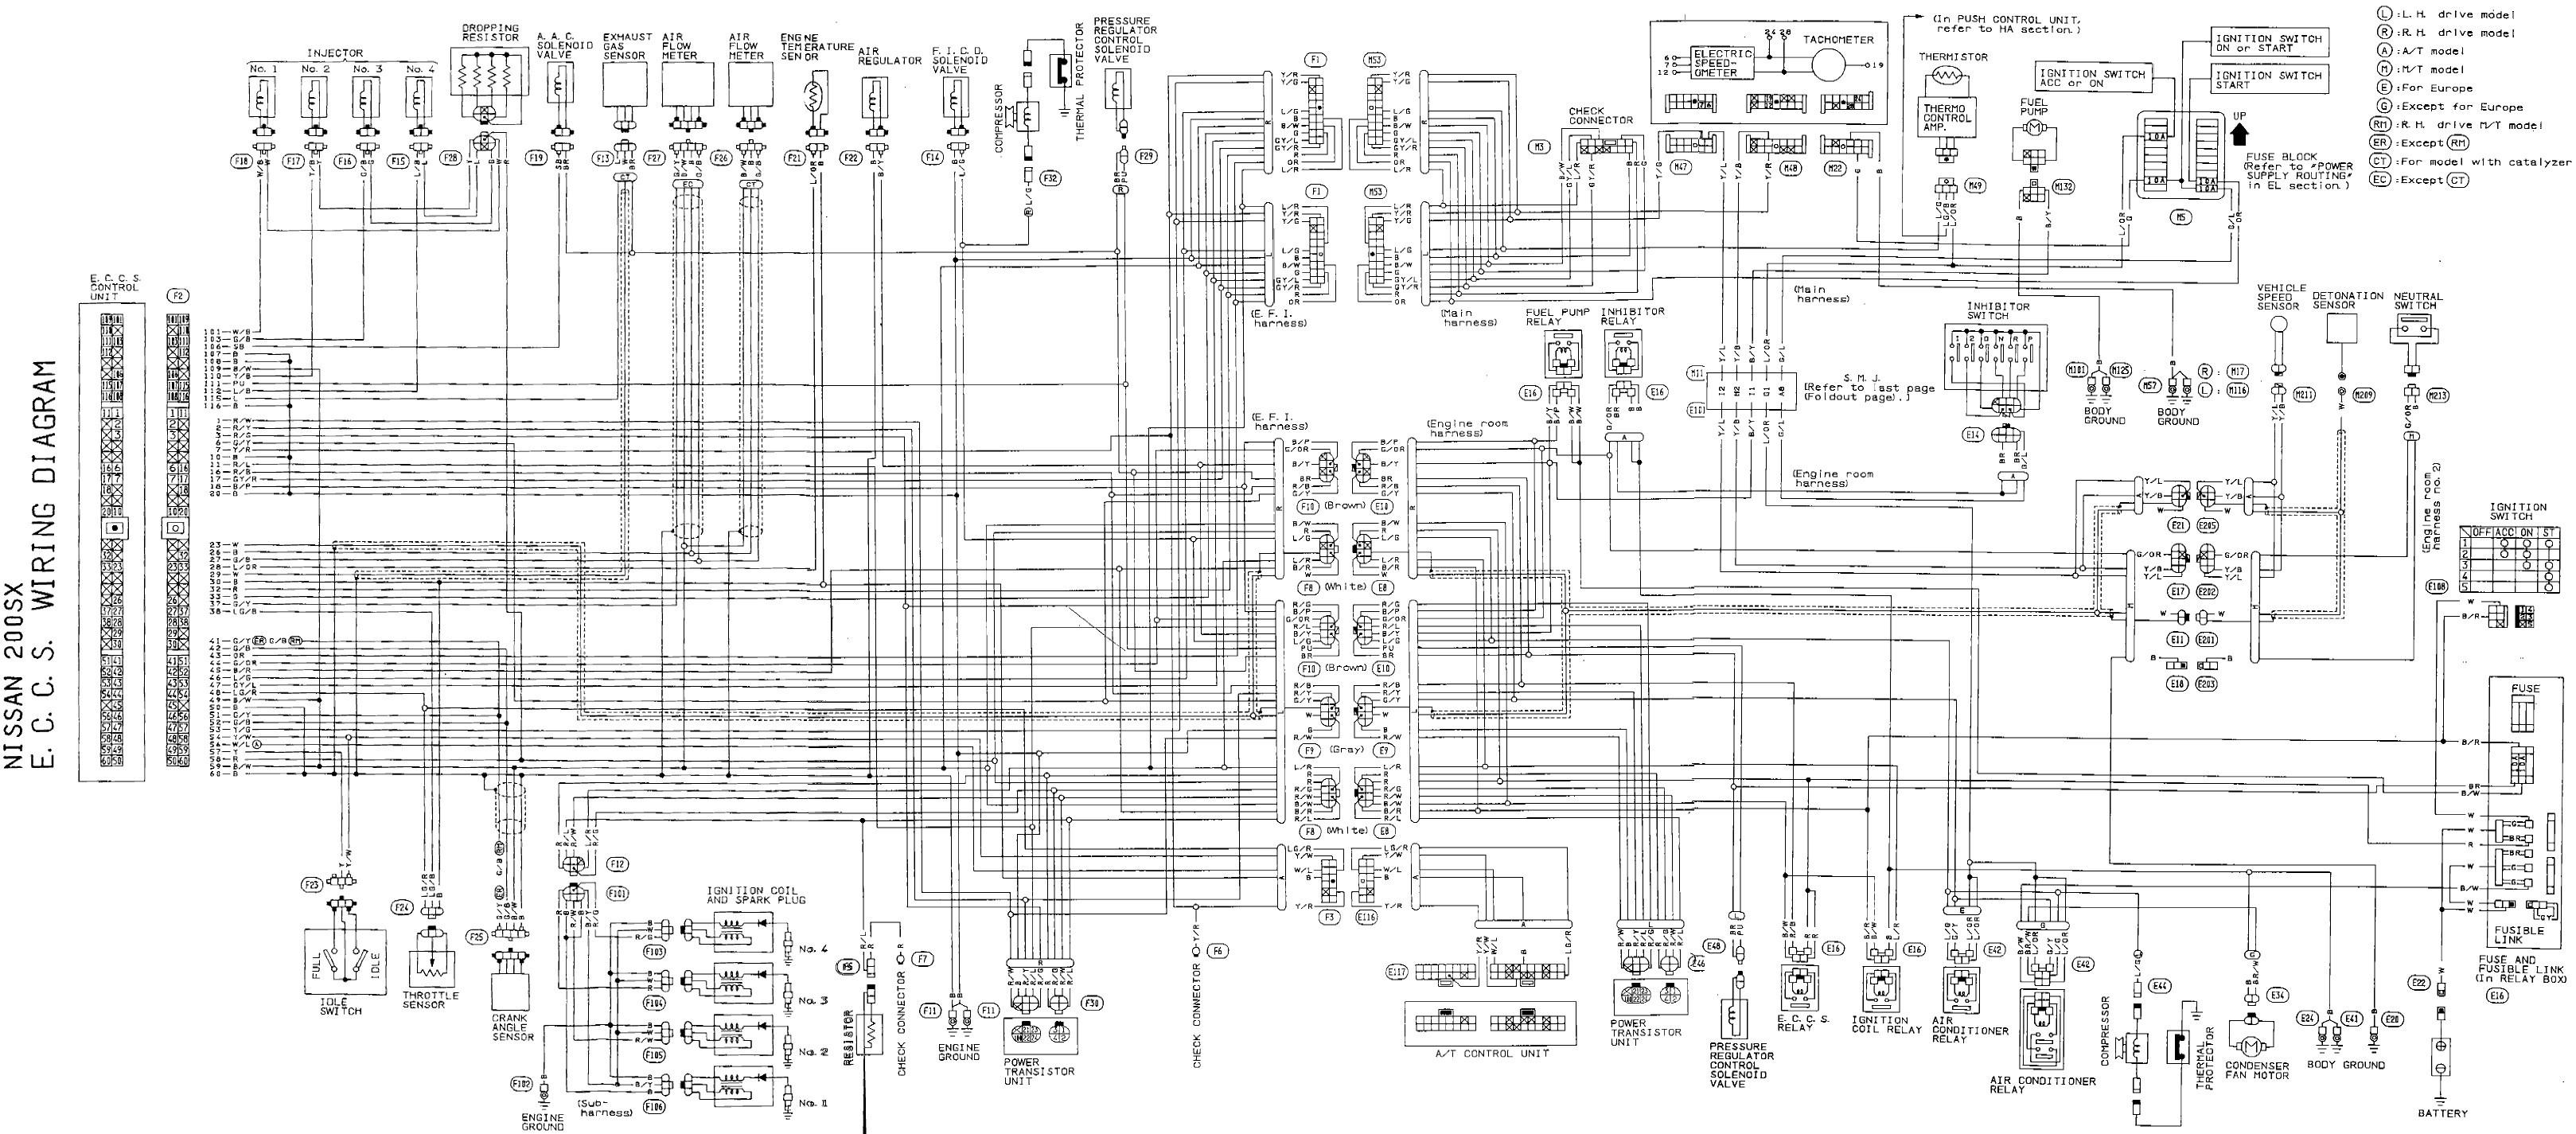 Jaguar X Type Wiring Diagram Großartig Jaguar S Typ